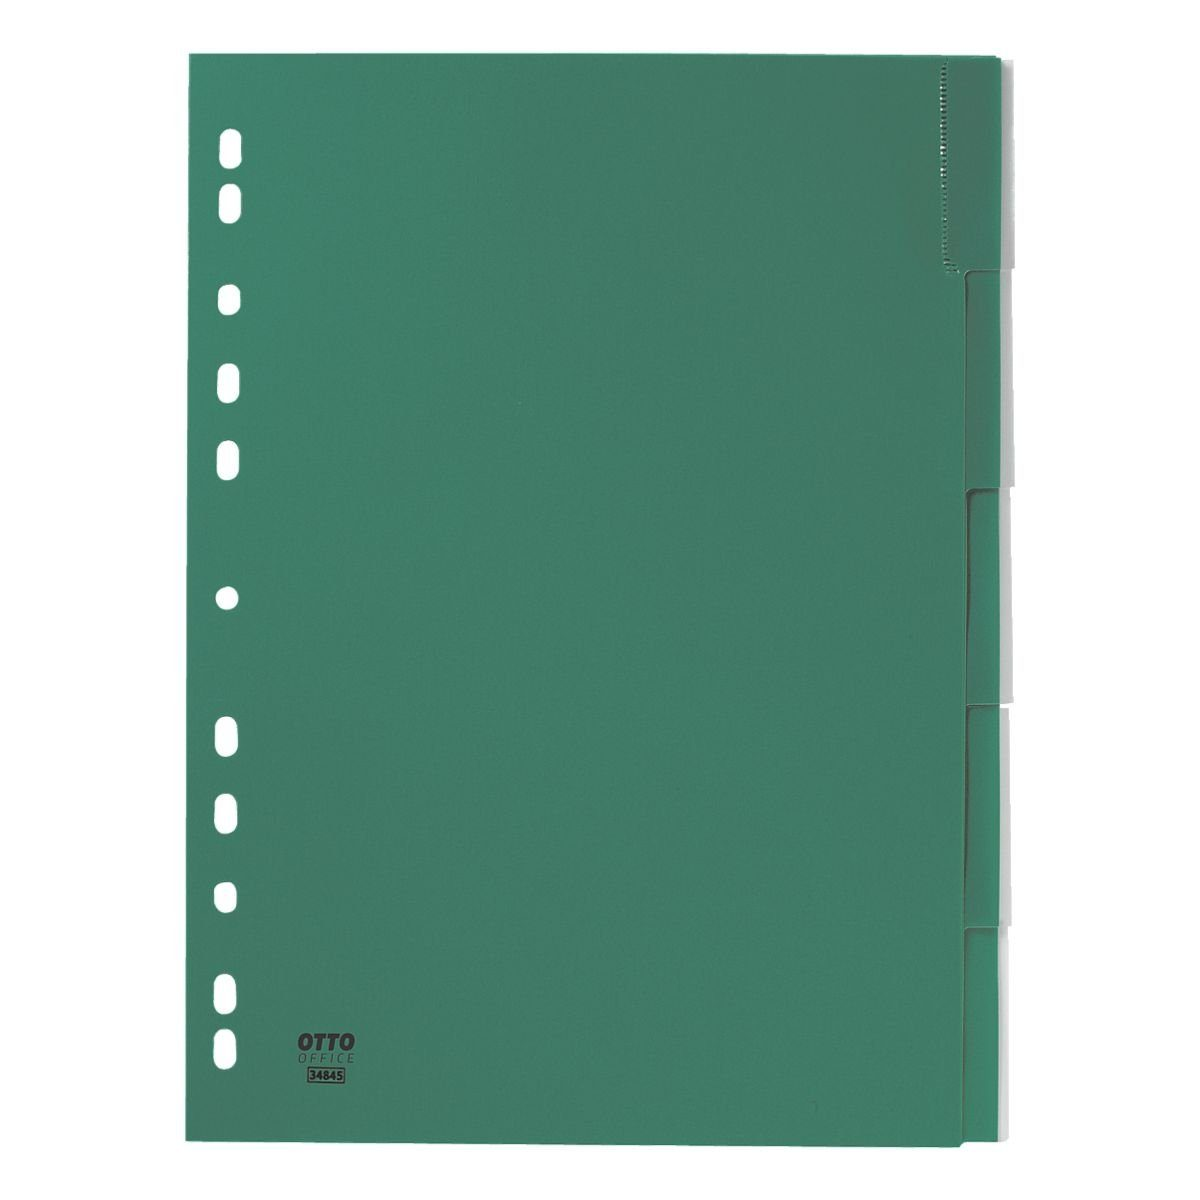 OTTO Office Standard Kunststoffregister 5-tlg. grün